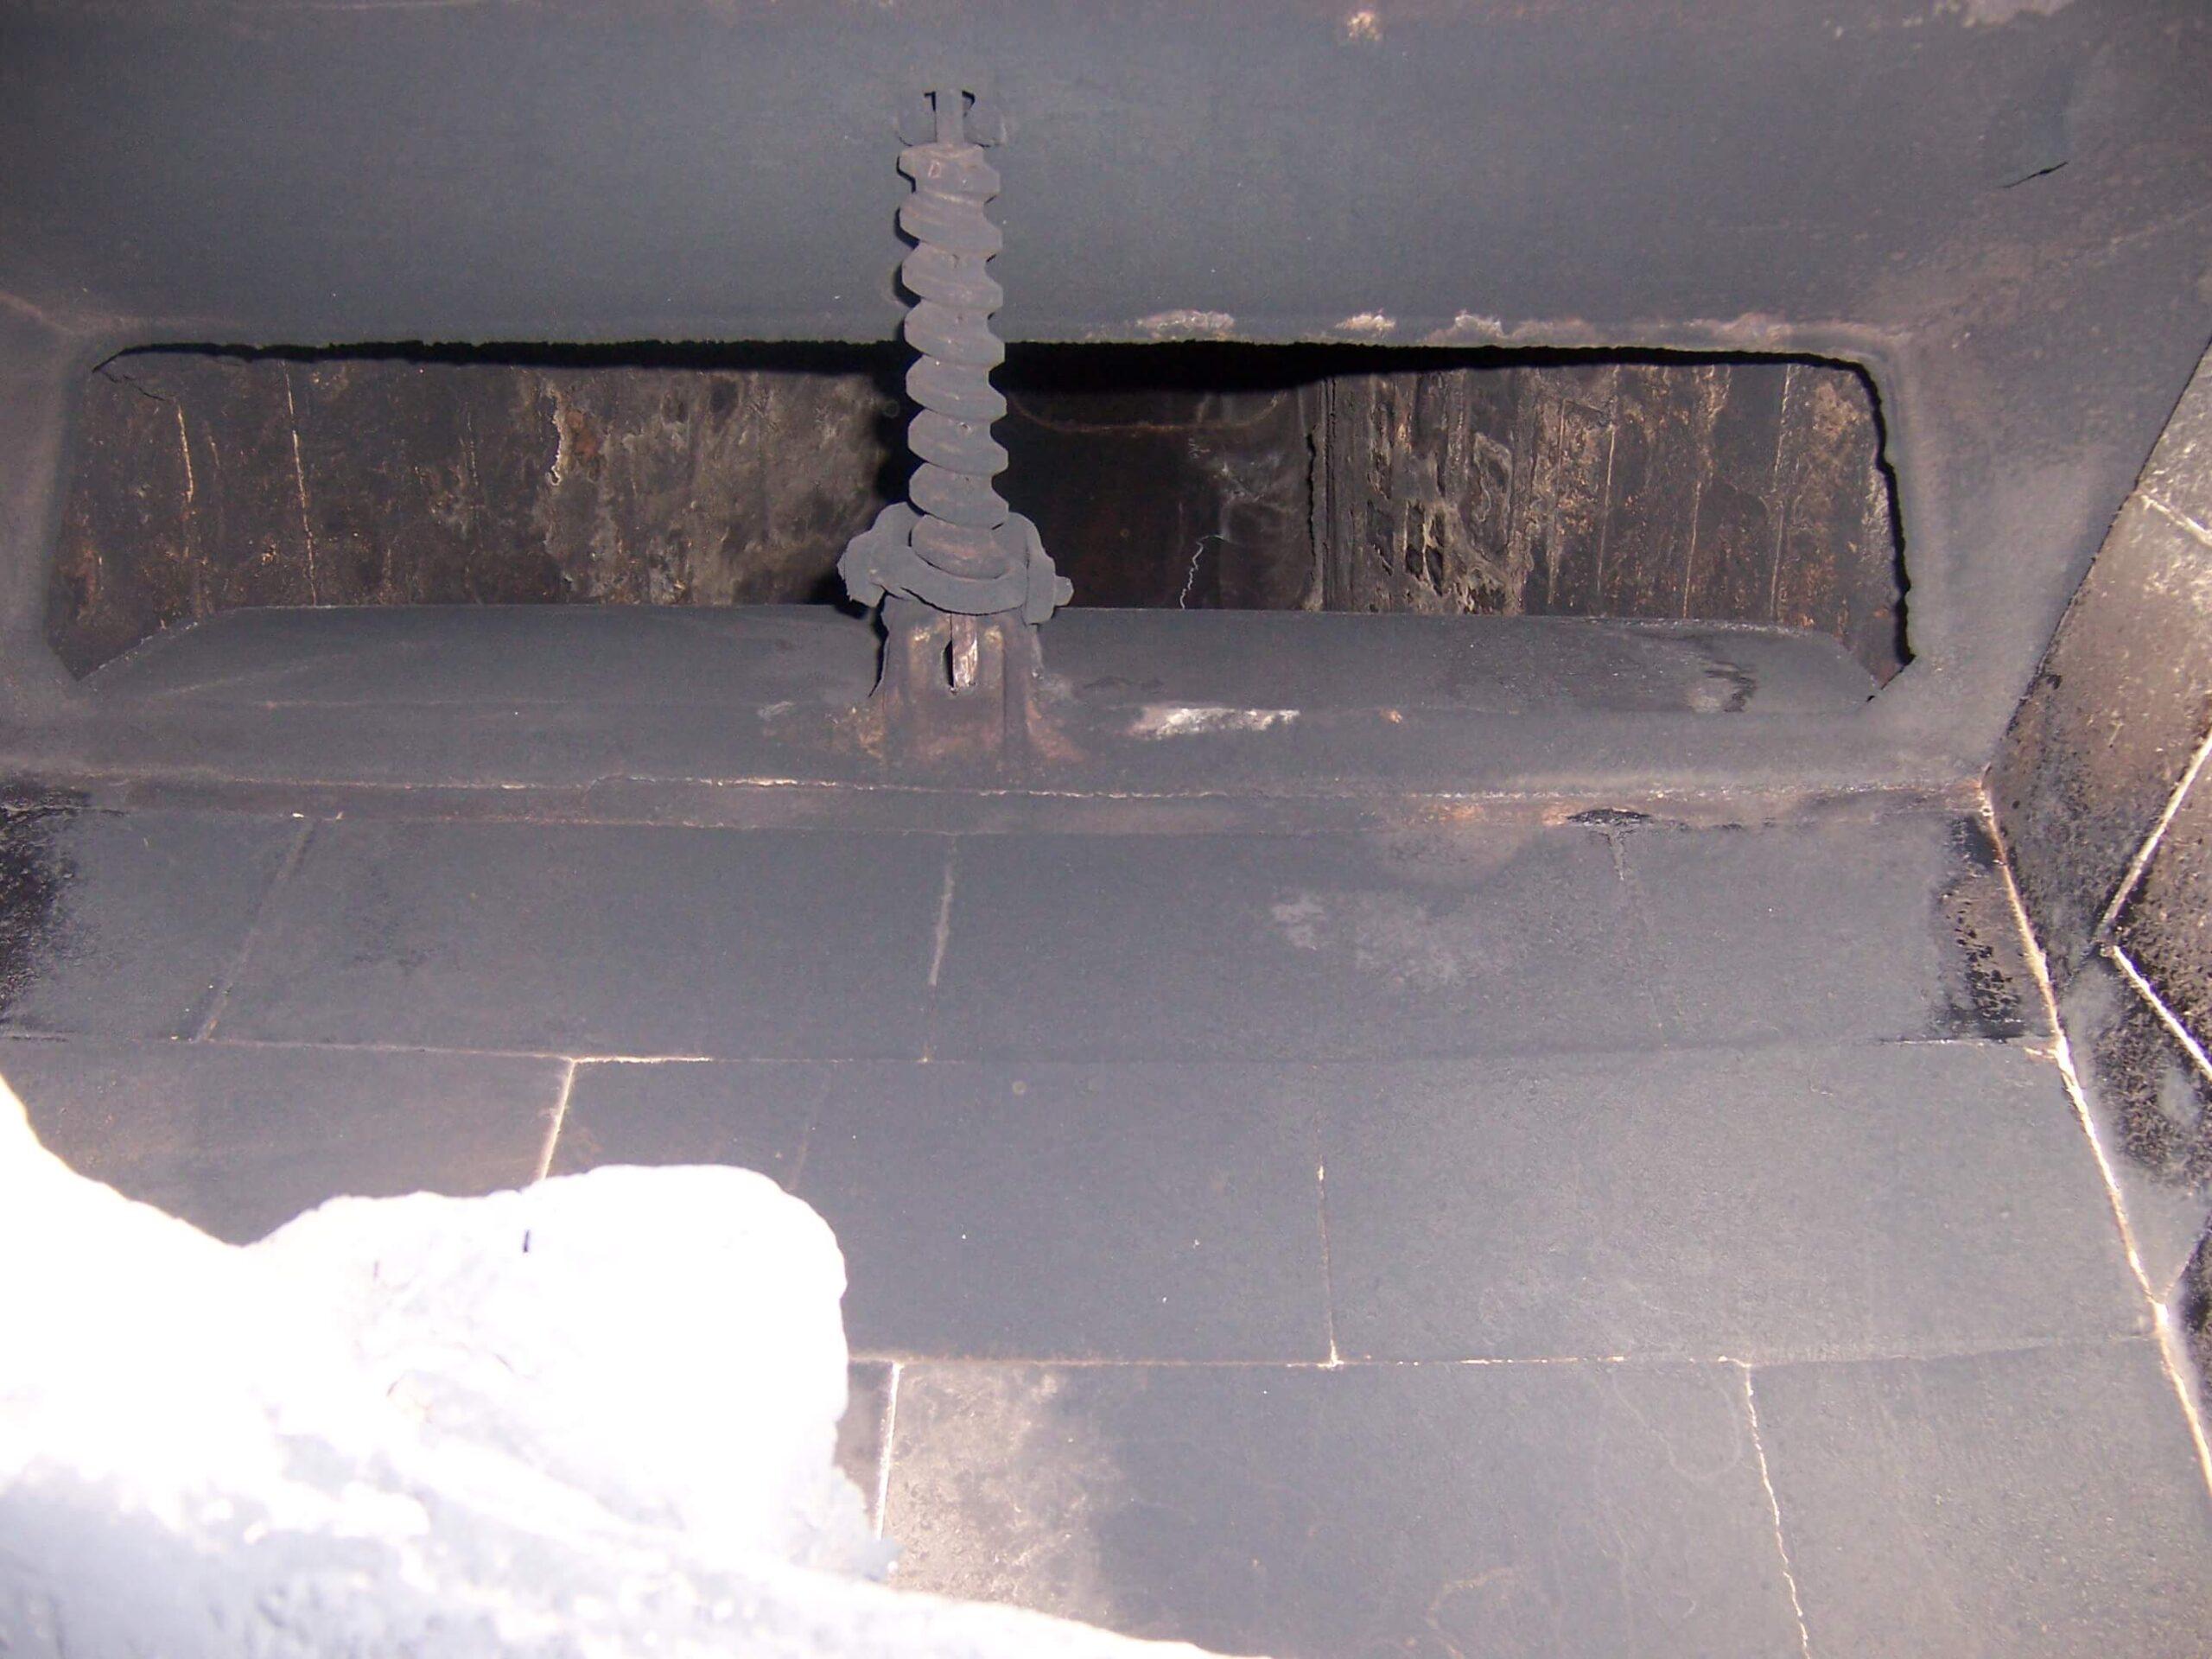 Vestal damper with worm gear actuator